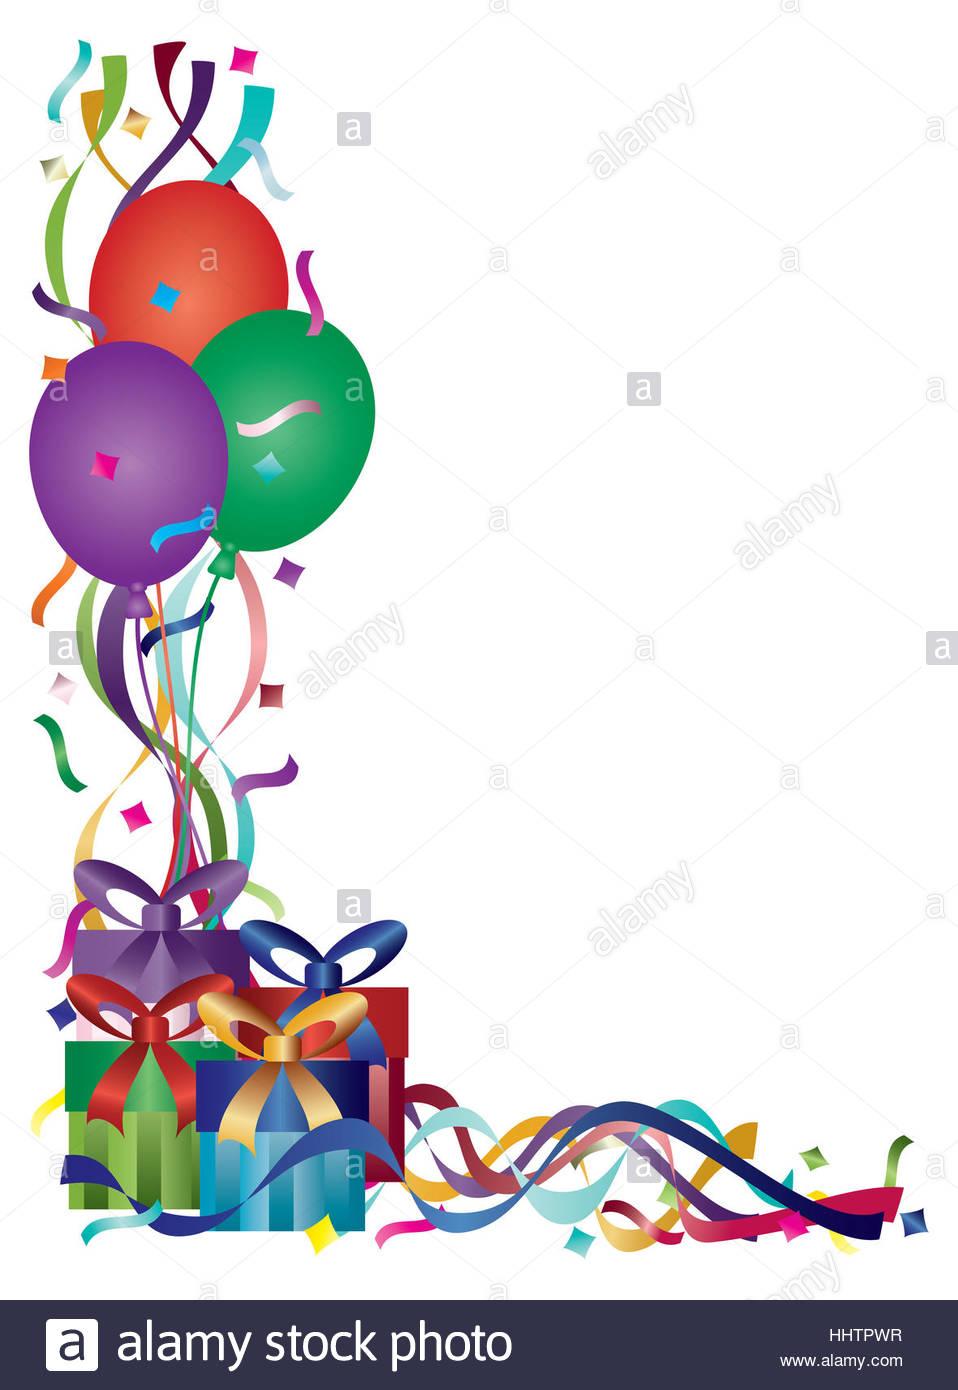 958x1390 Party, Celebration, Gift, Balloons, Ballon, Presents, Confetti